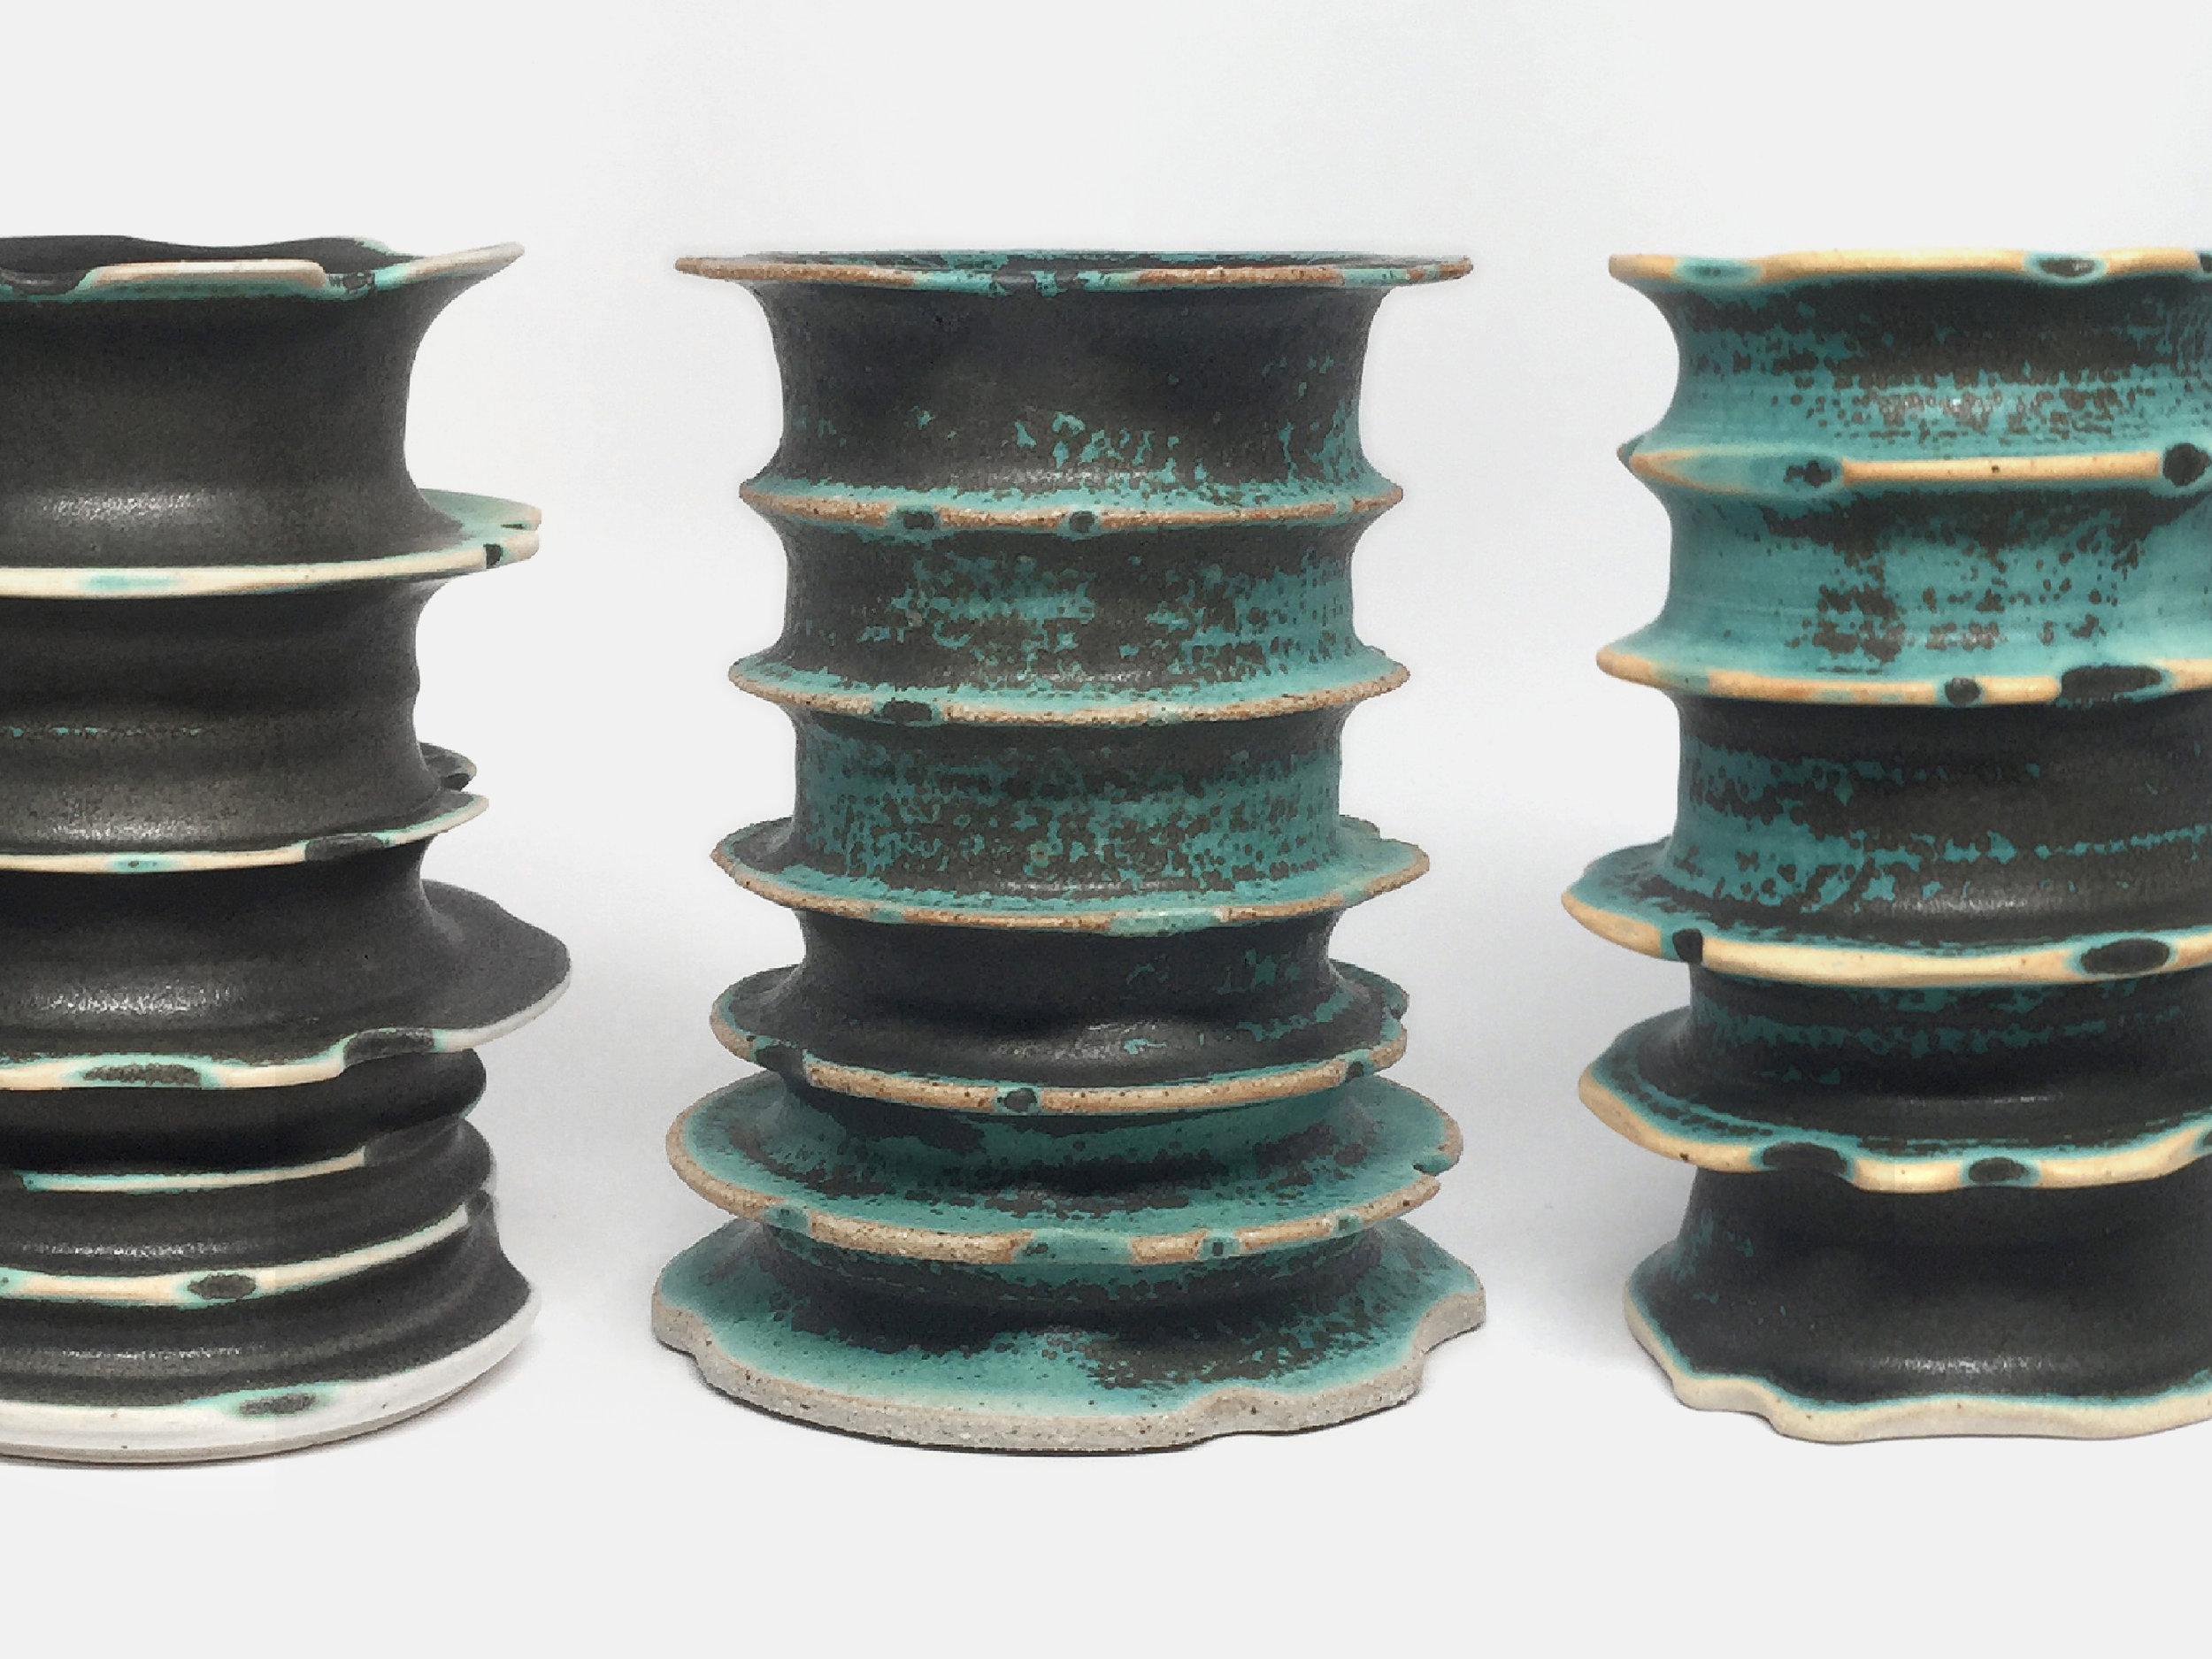 bracket_vases.jpg